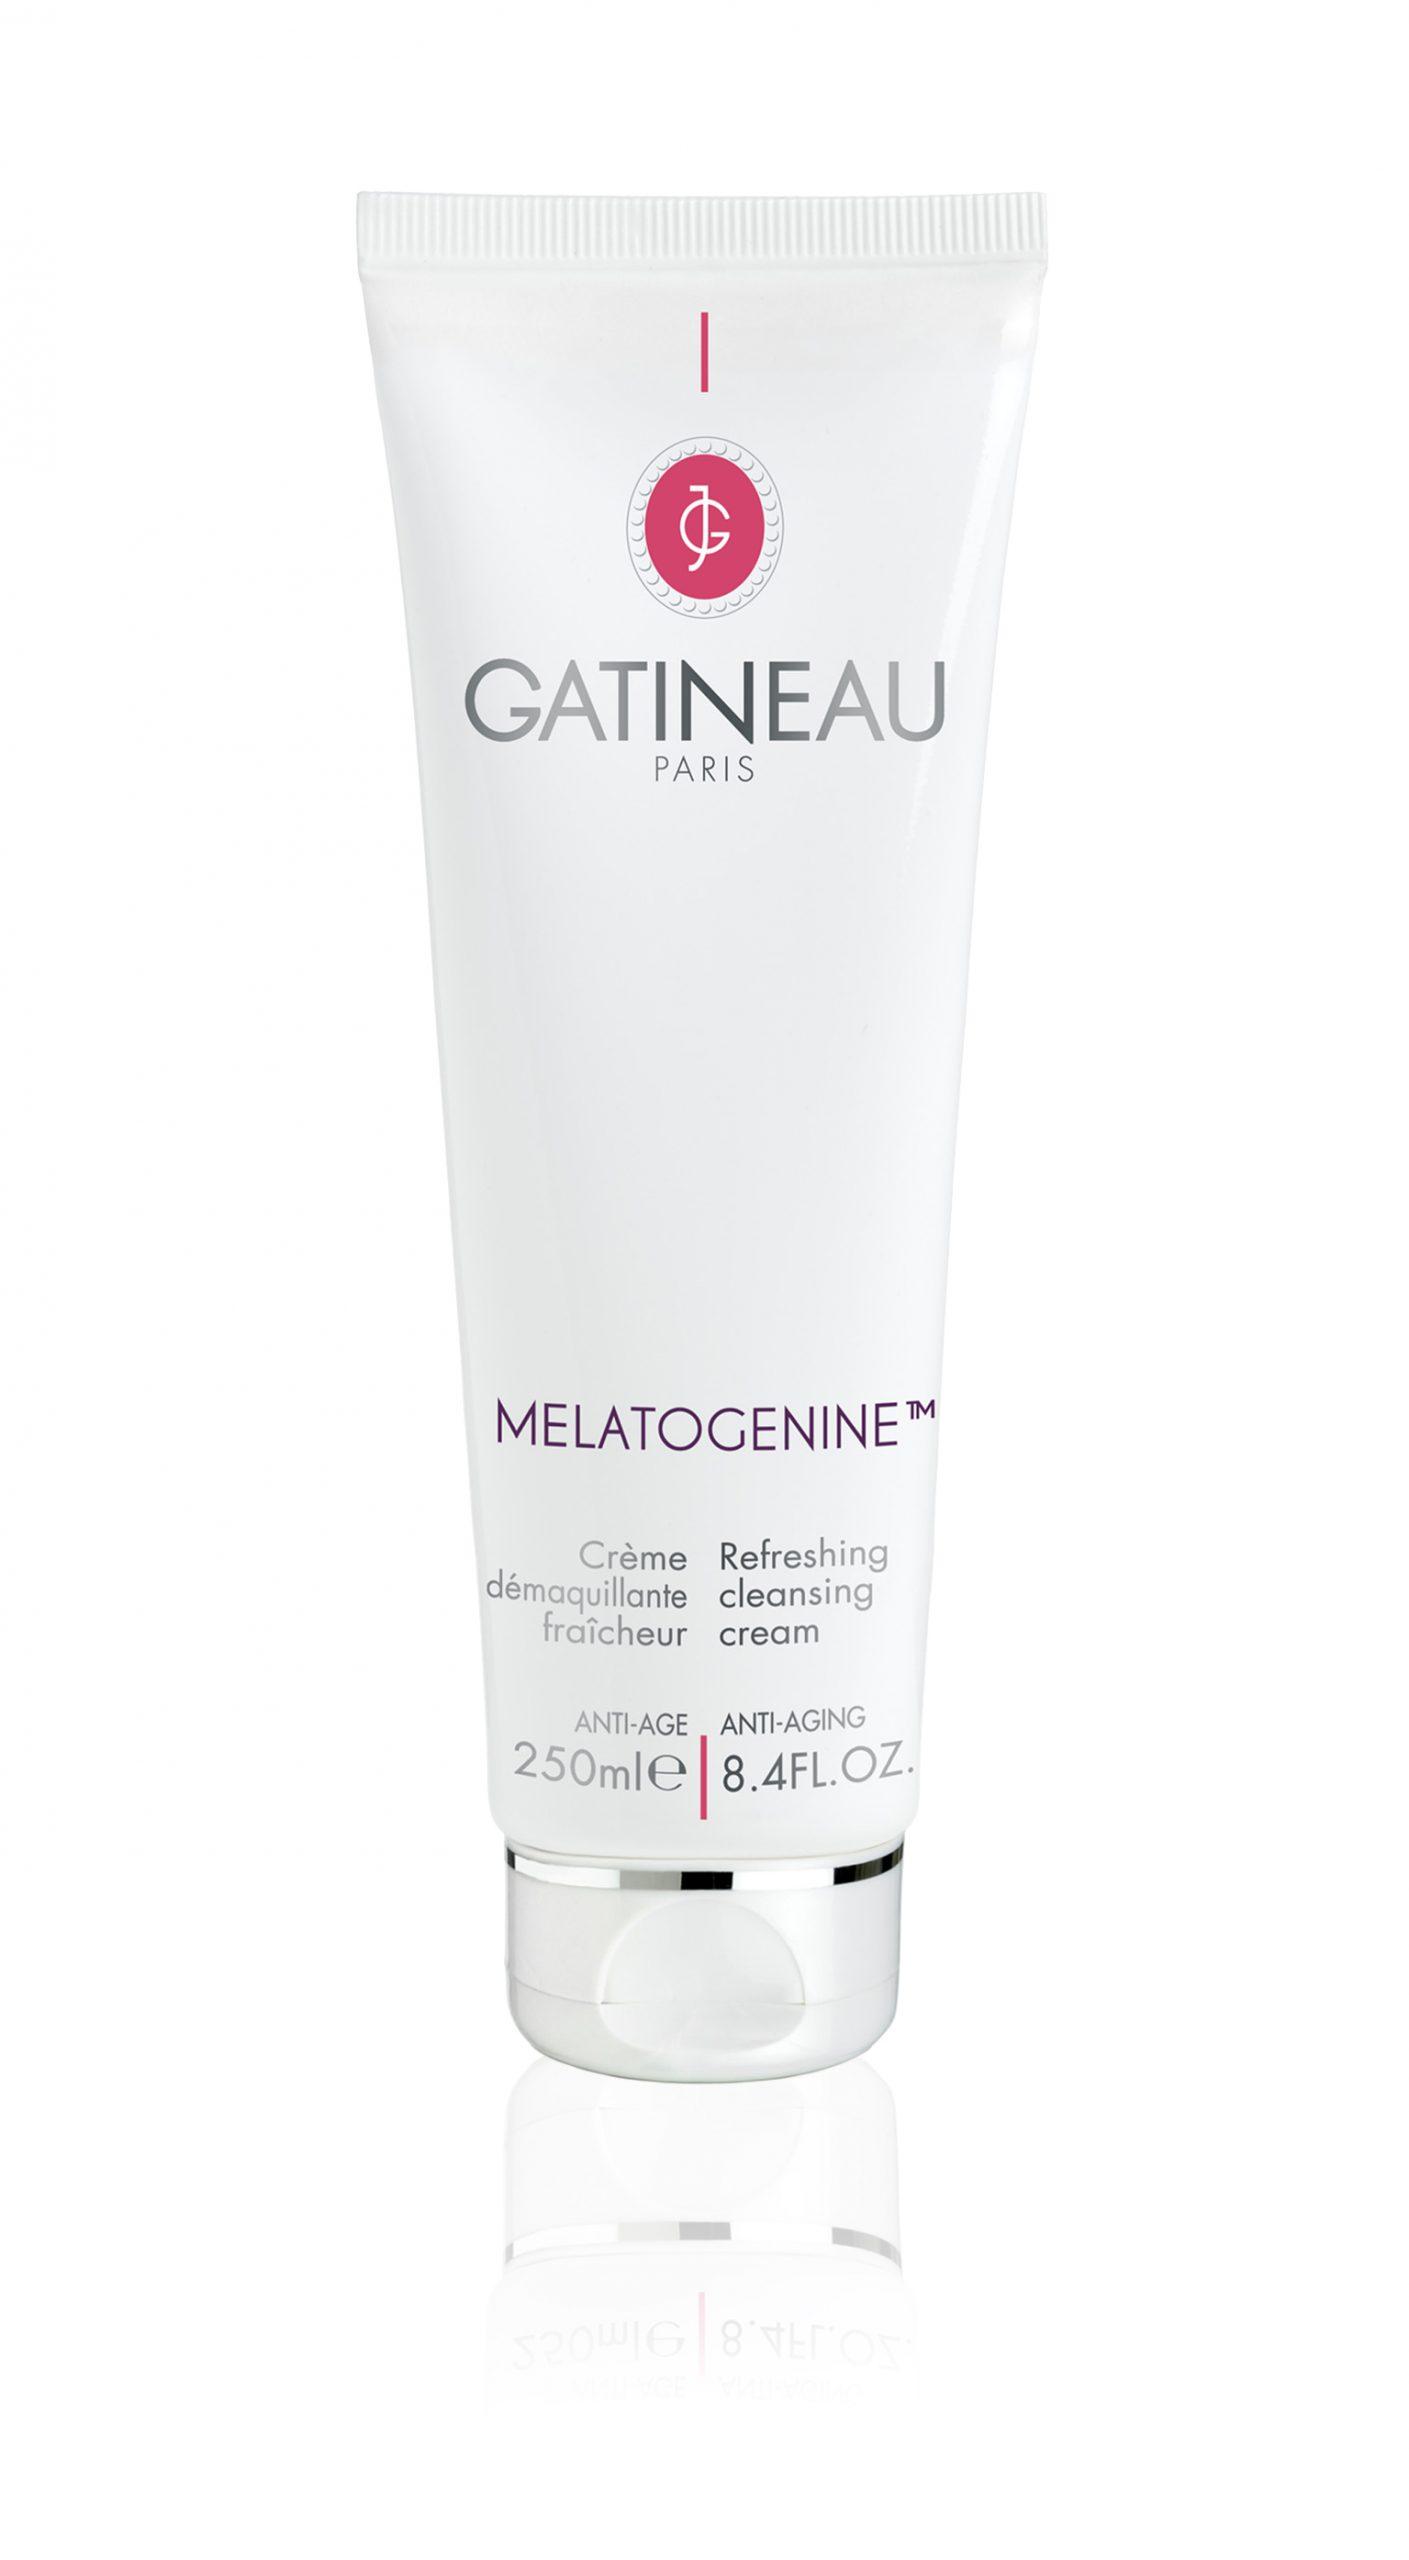 Melatogenine™ Refreshing Cleansing Cream 250ml